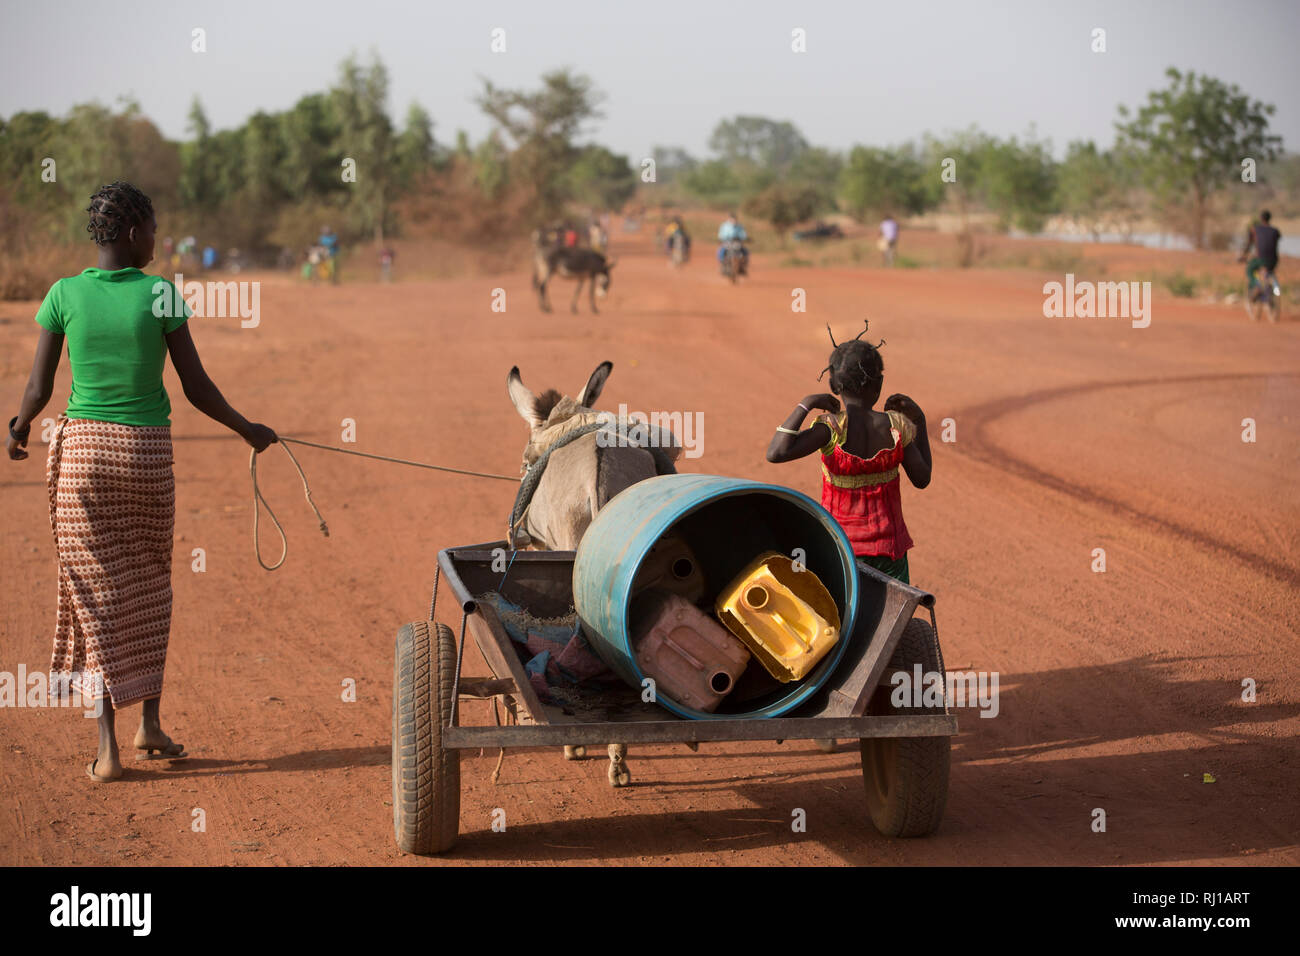 Samba village, Yako Province, Burkina Faso: Abzetta Sondo, 19, fetches water for her household. - Stock Image